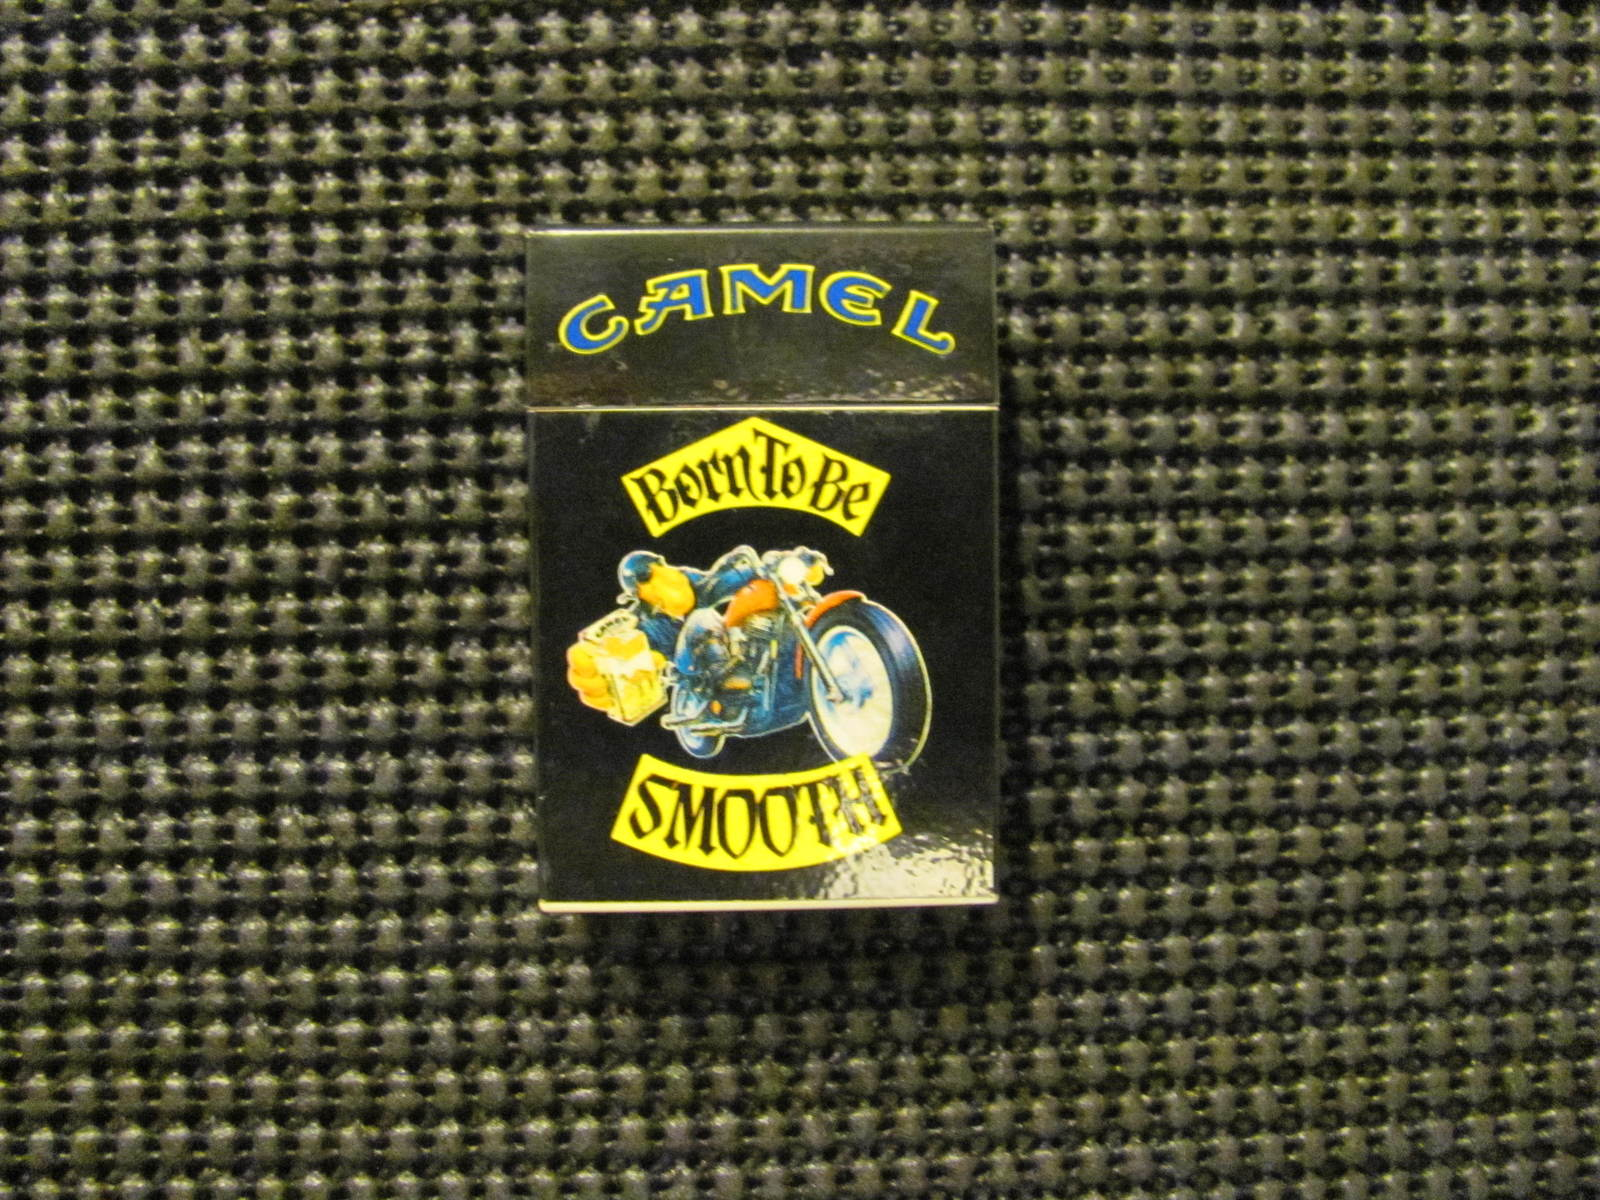 Camel 'Born to be Smooth' Butane Lighter - $11.95